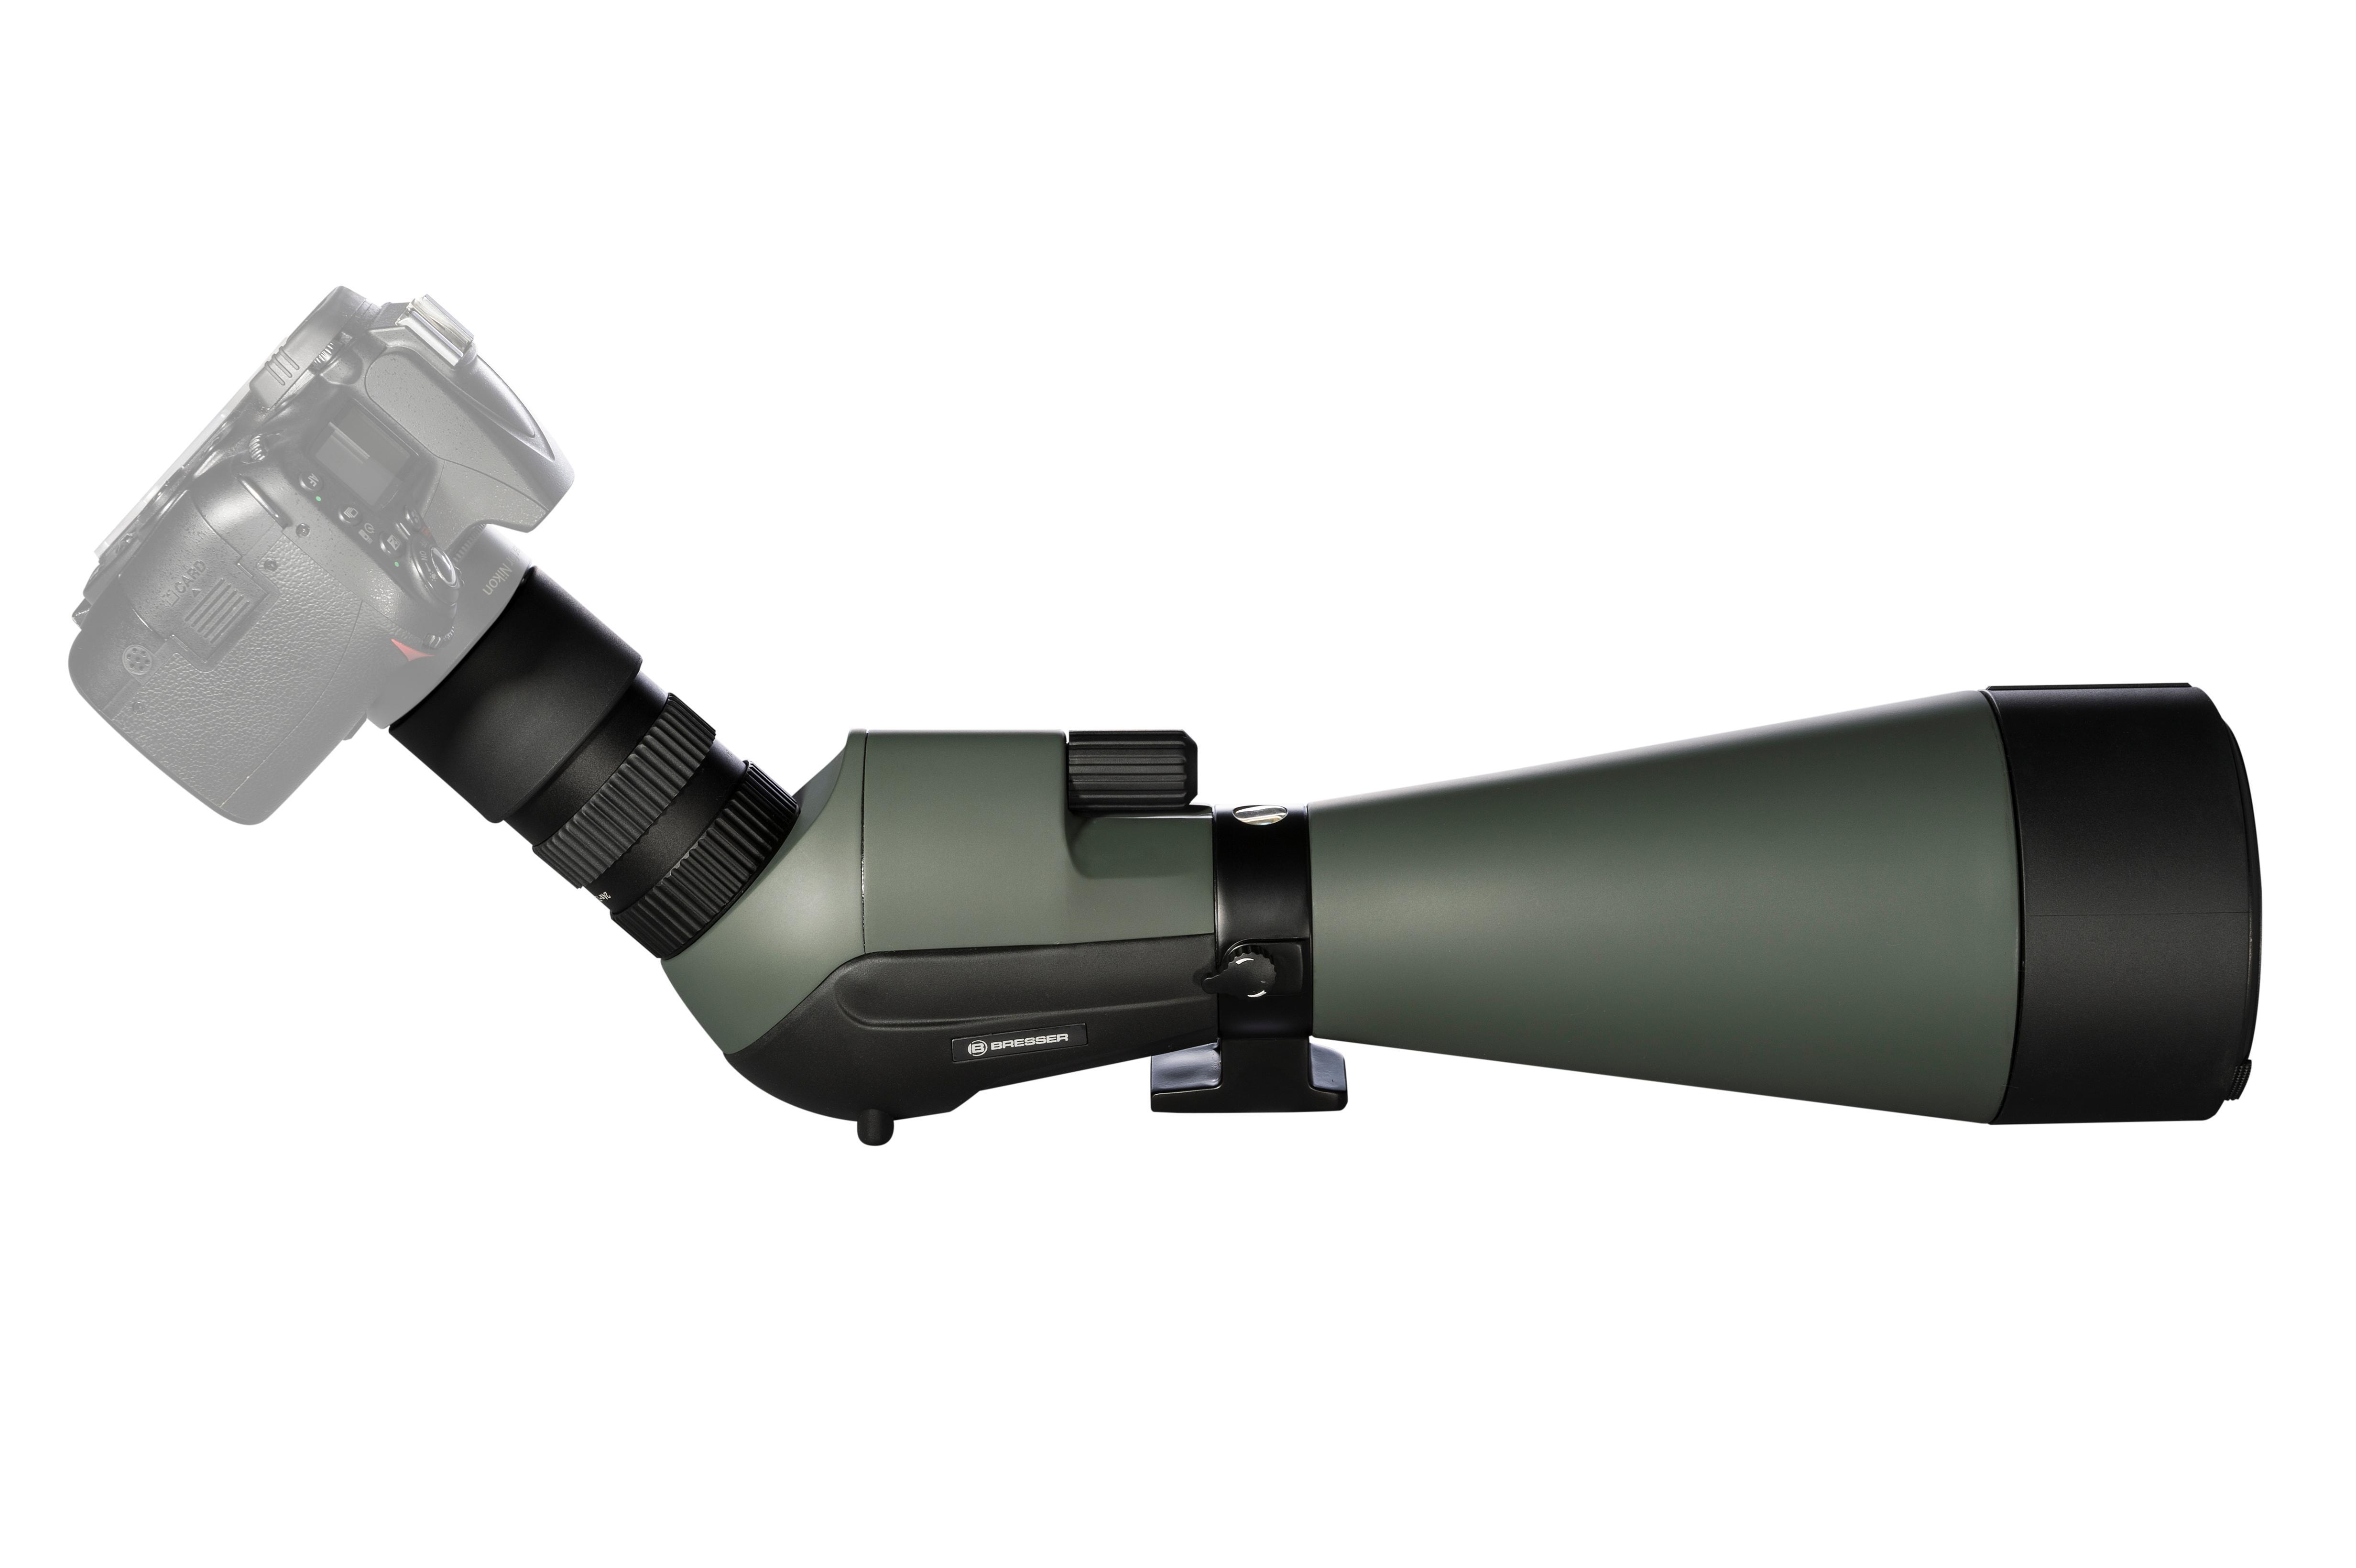 Bresser Spektiv Condor 20-60x85: Amazon.de: Kamera